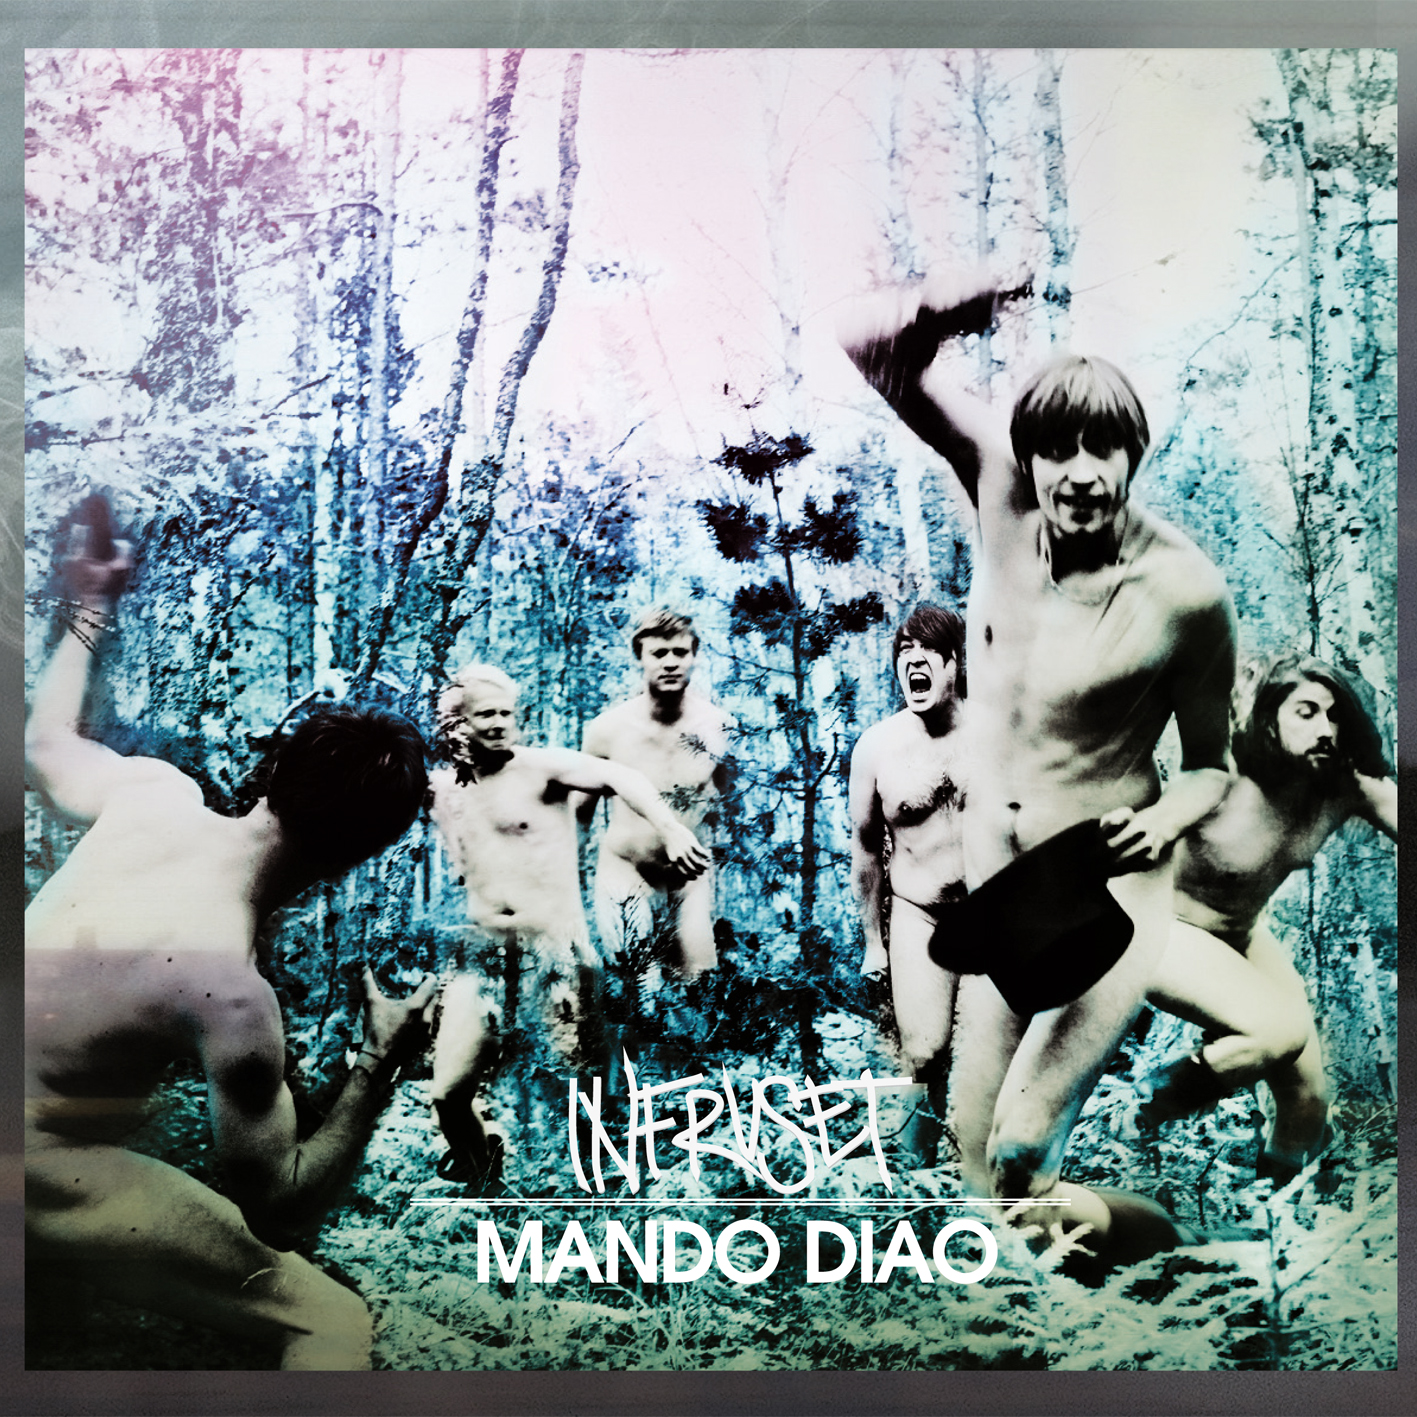 MANDO_INFRUSET